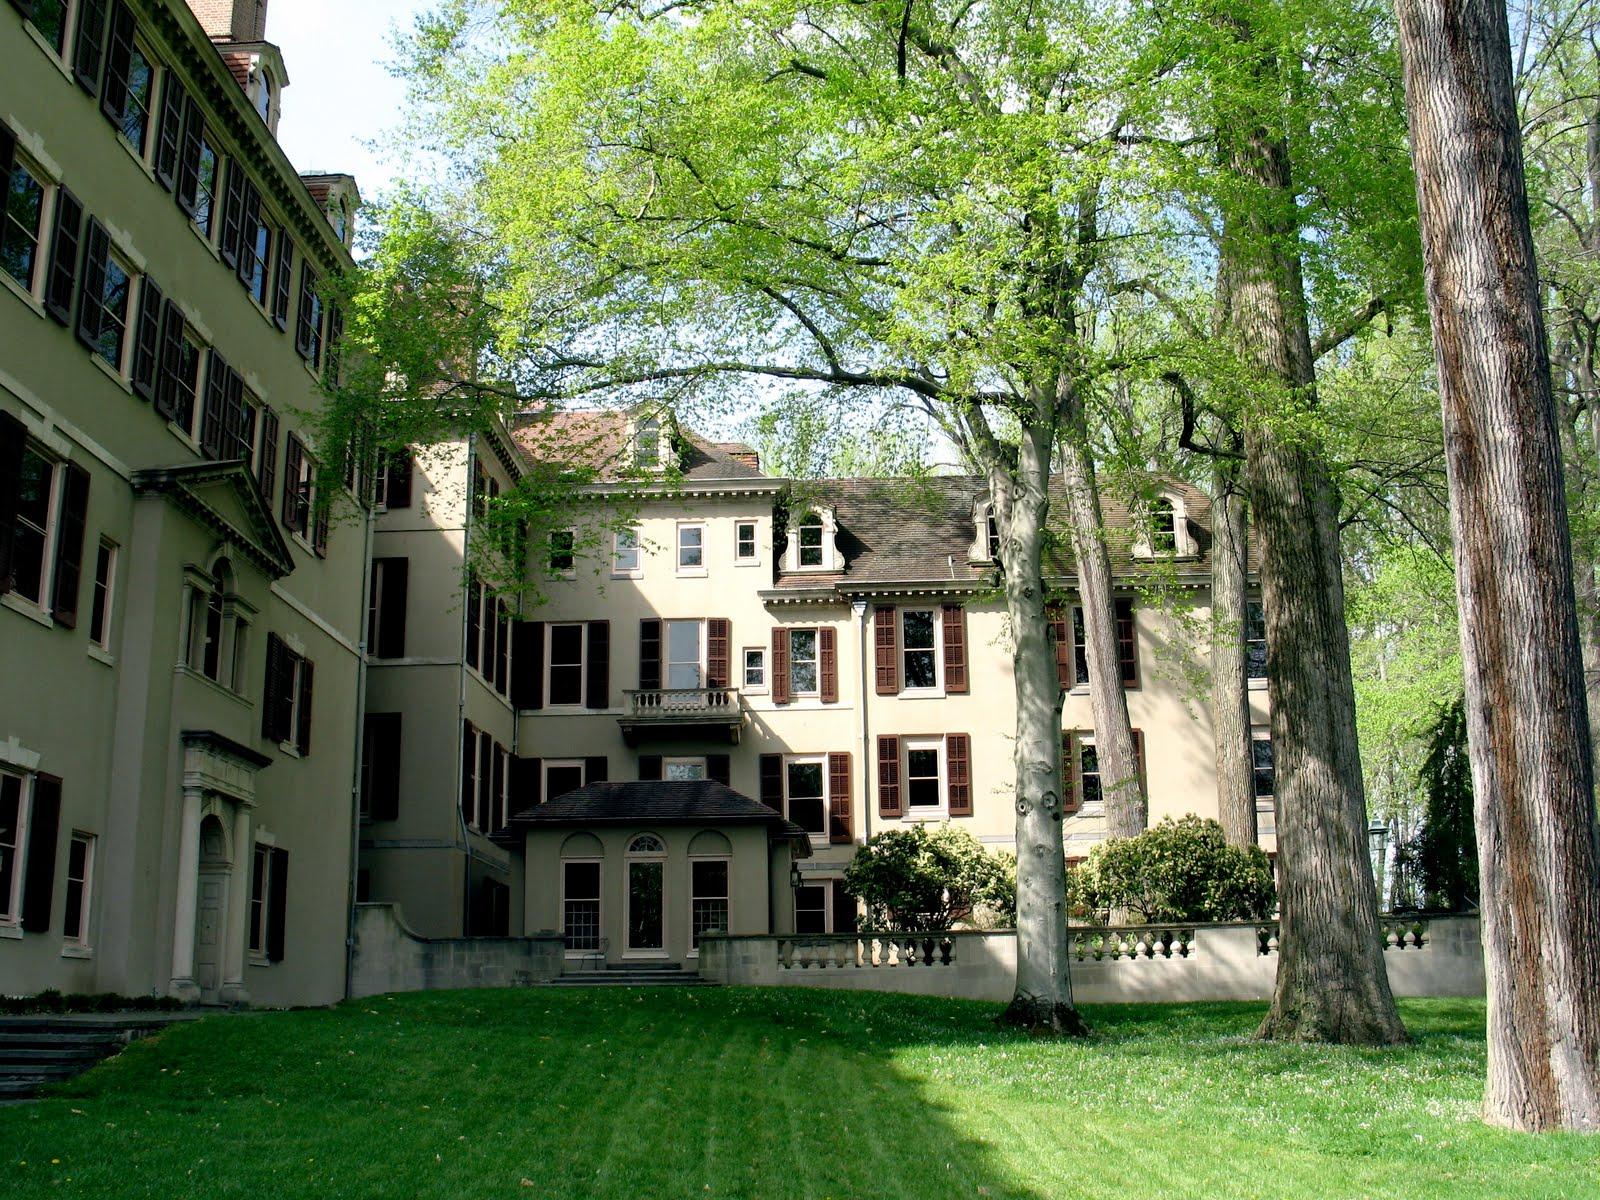 SETNESS TOURS: Day 3: Longwood Gardens & Winterthur Museum